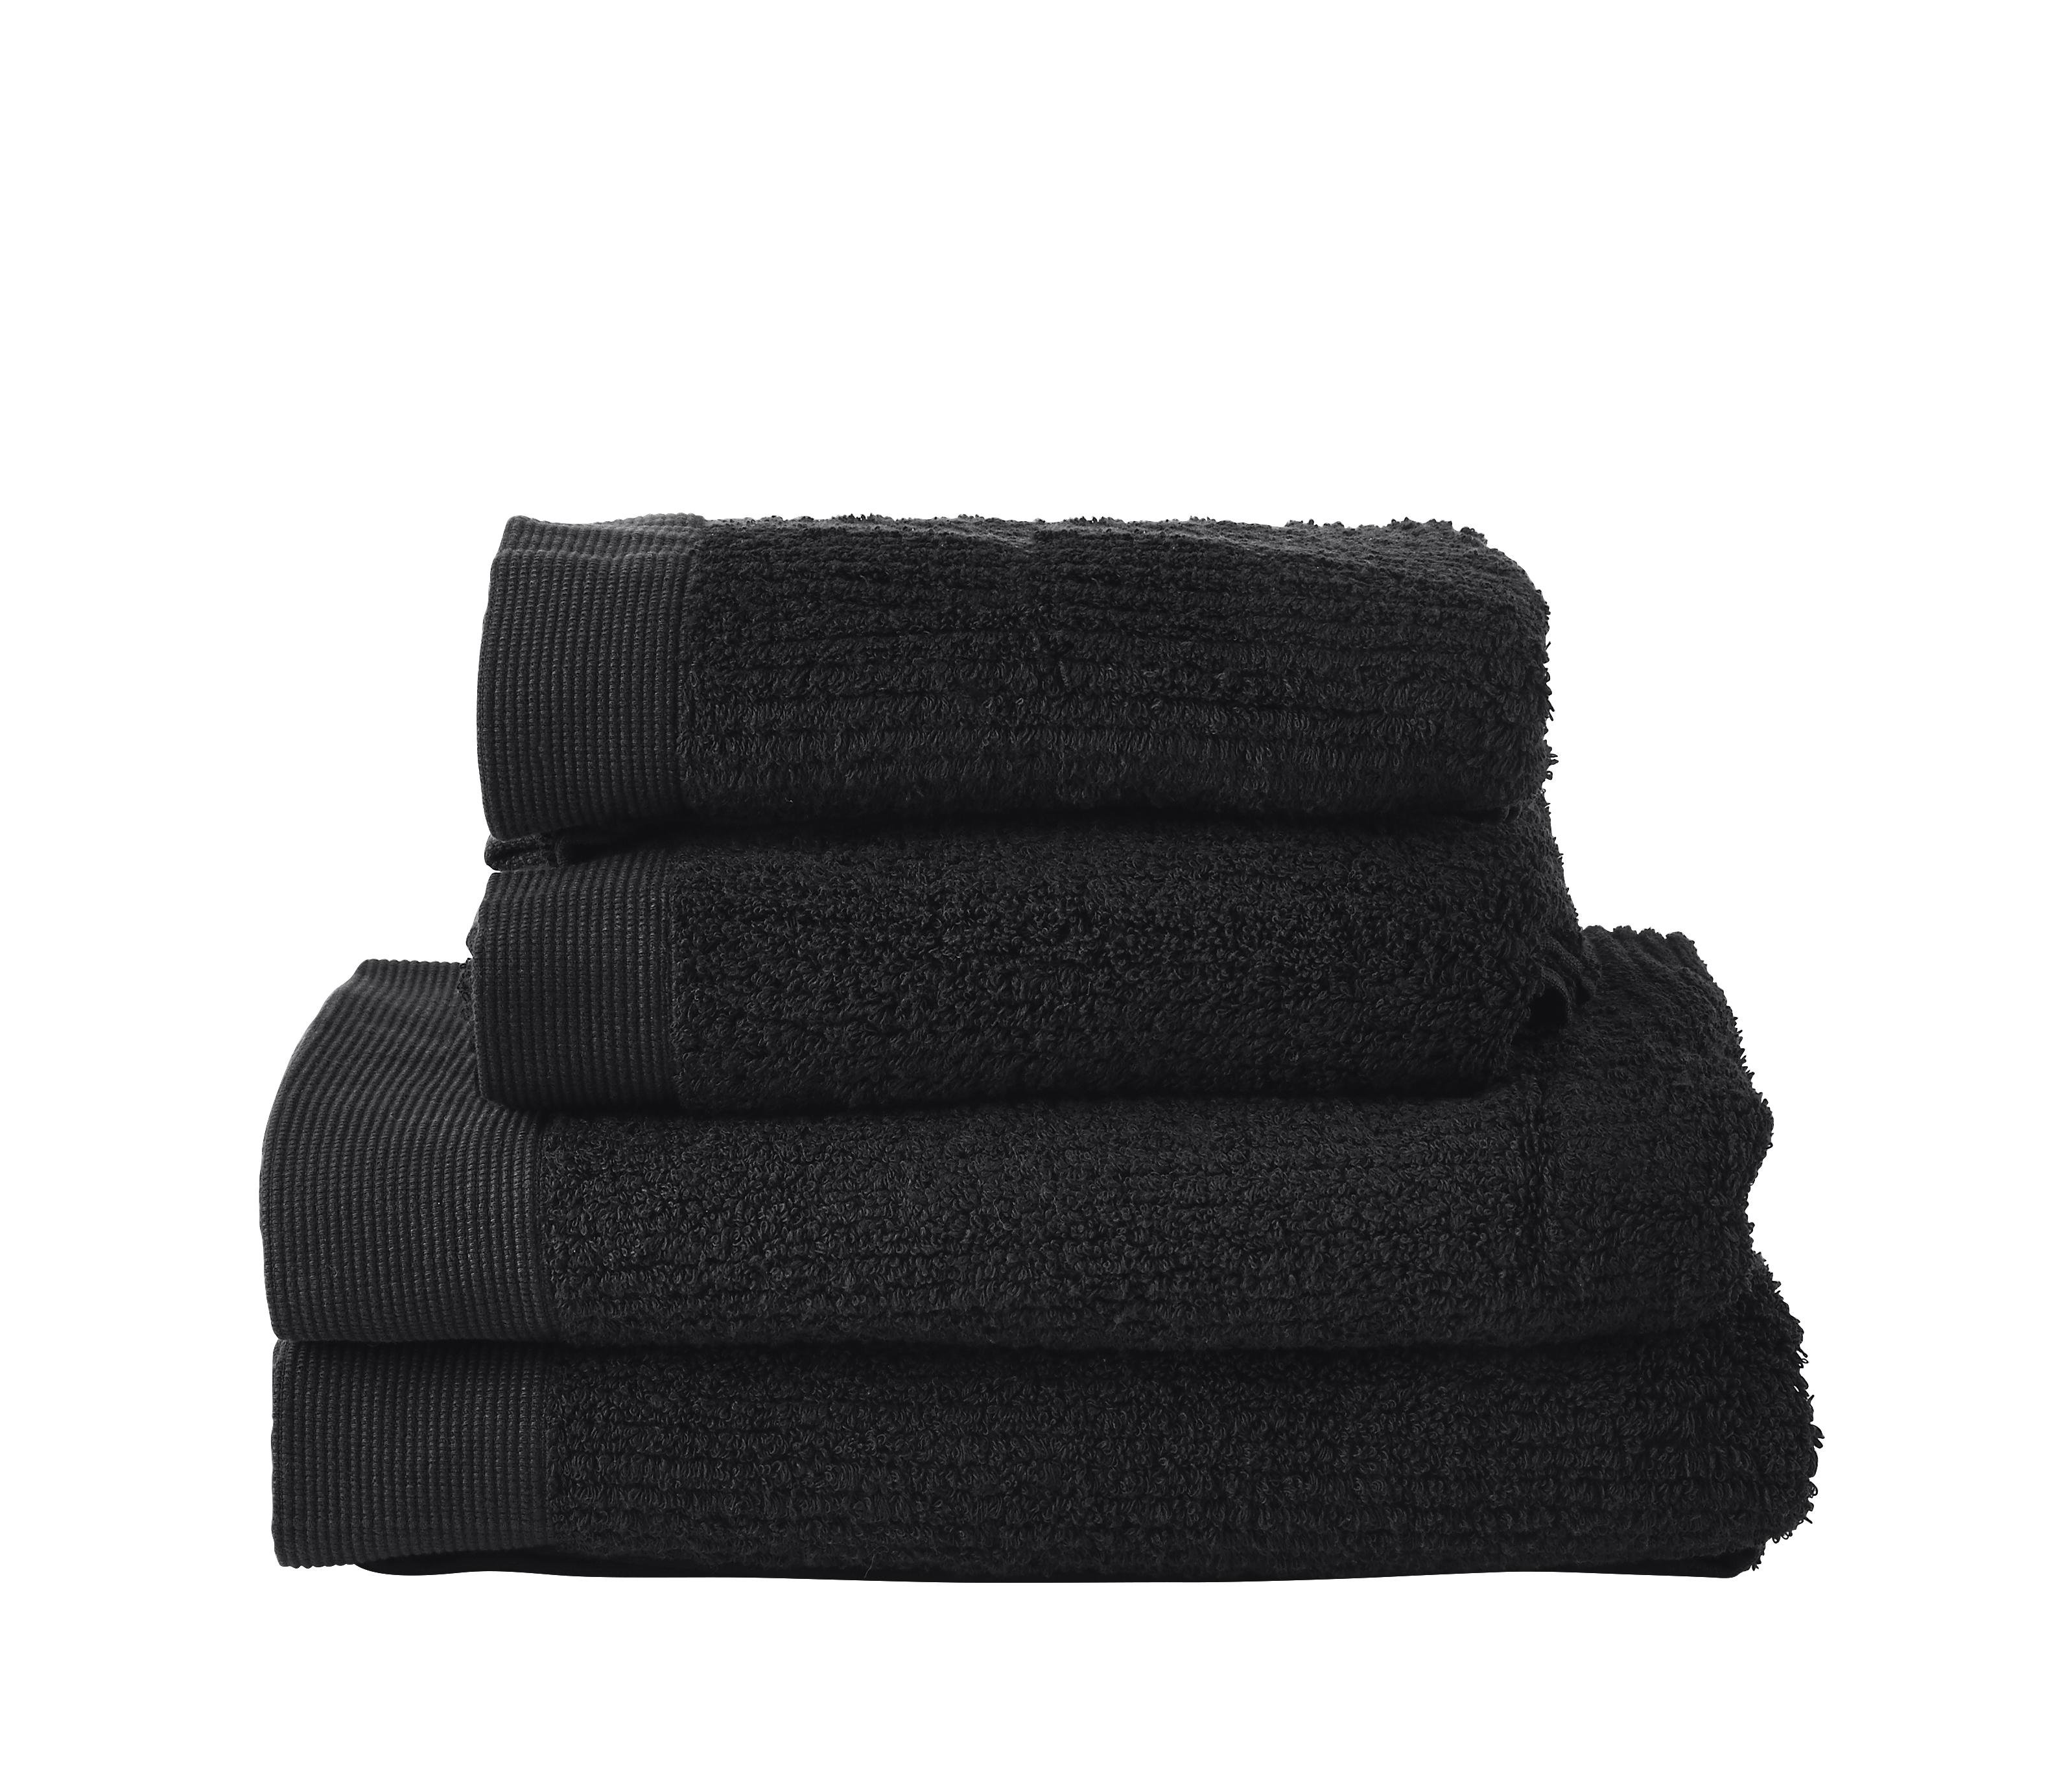 Zone - Classic Towel Set - Black (330846)